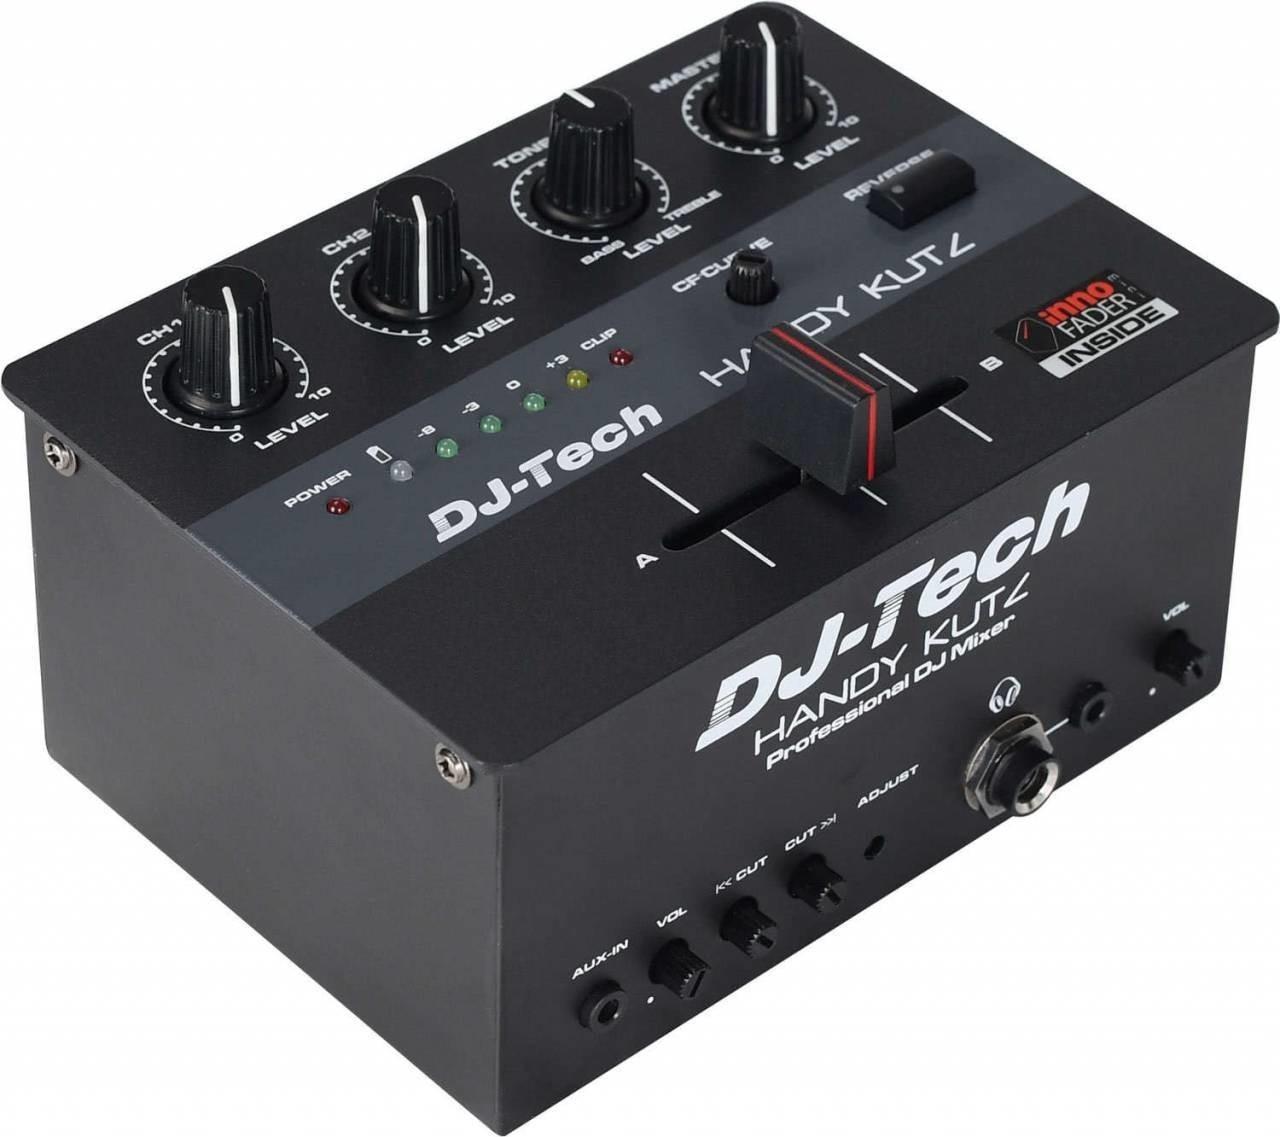 Image of DJ-Tech Handy Kutz